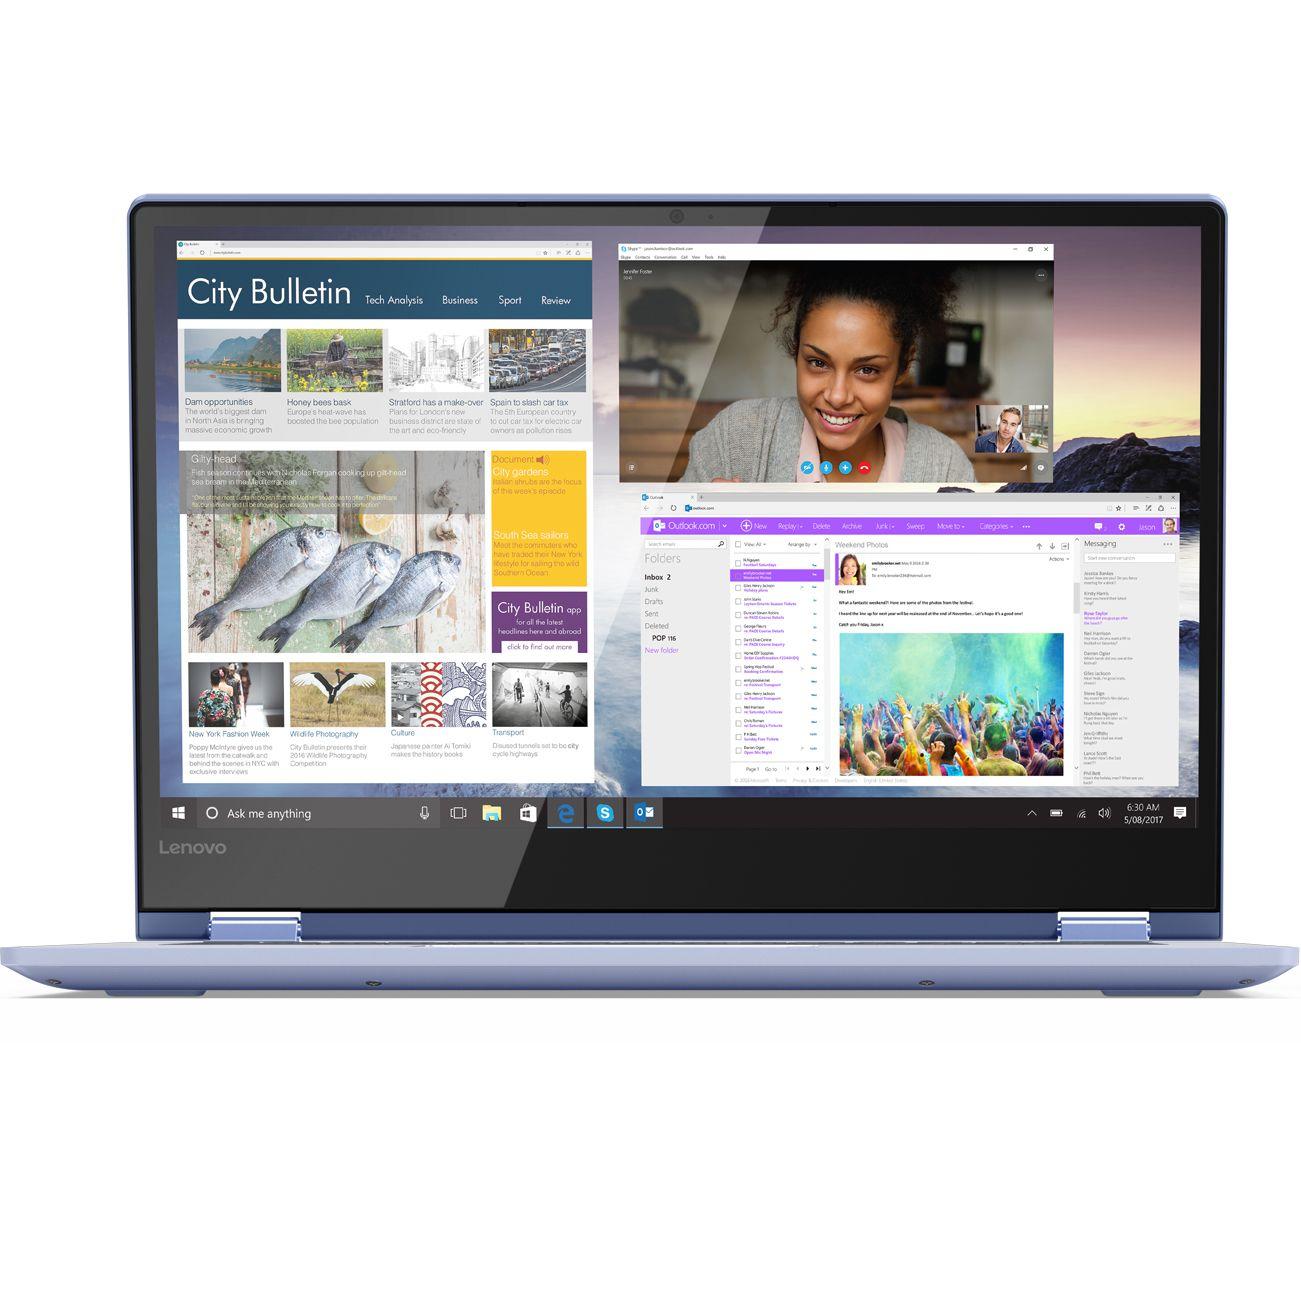 Ultrabook Lenovo Yoga 530 14 Full HD Touch Intel Core i5-8250U RAM 8GB SSD 512GB Windows 10 Home Albastru